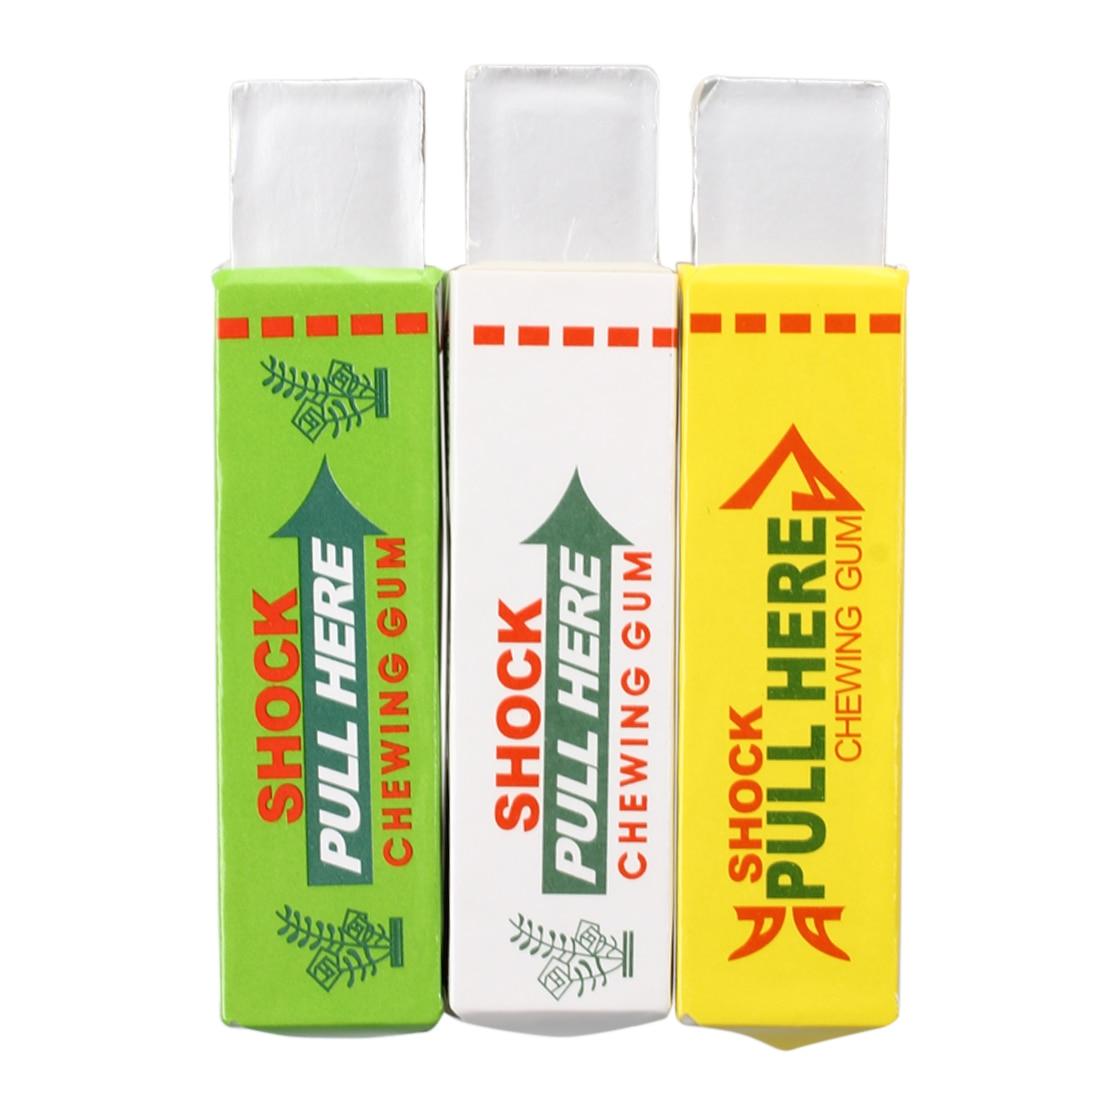 FBIL-3X Security novelty electric shock chewing gum Gag Trick Joke Joke Prank